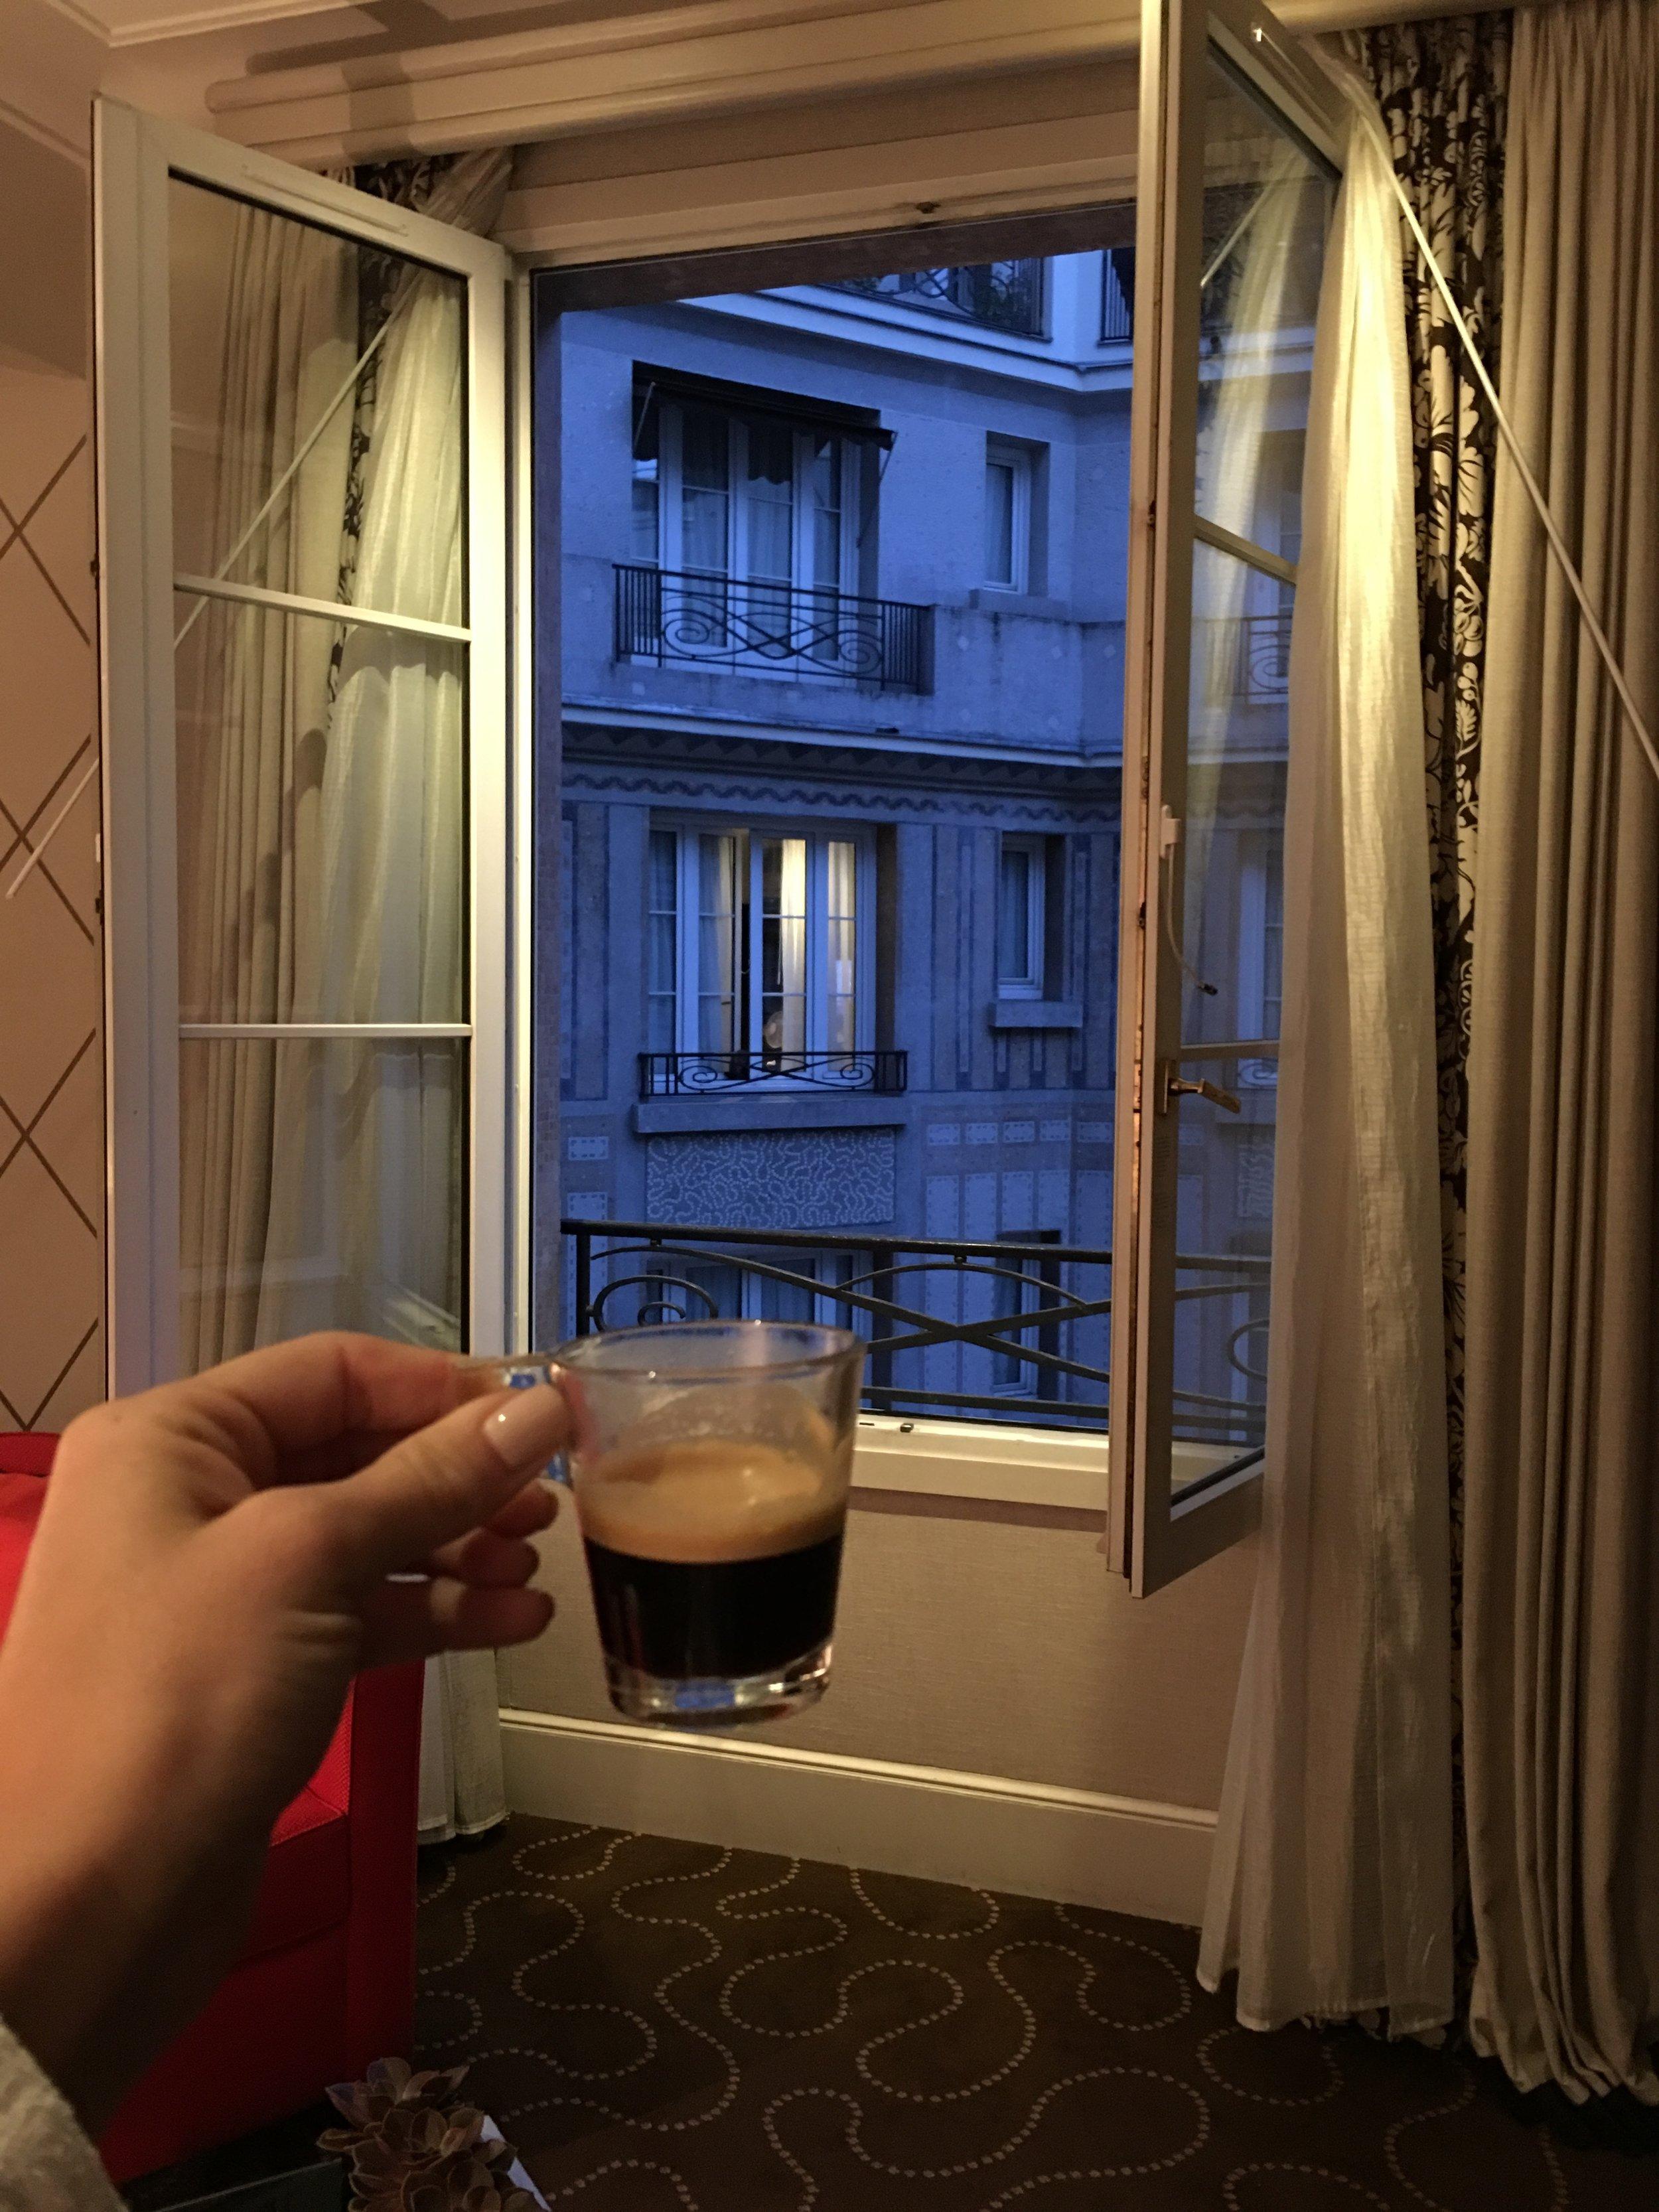 Espresso before the sunrise in our cute room